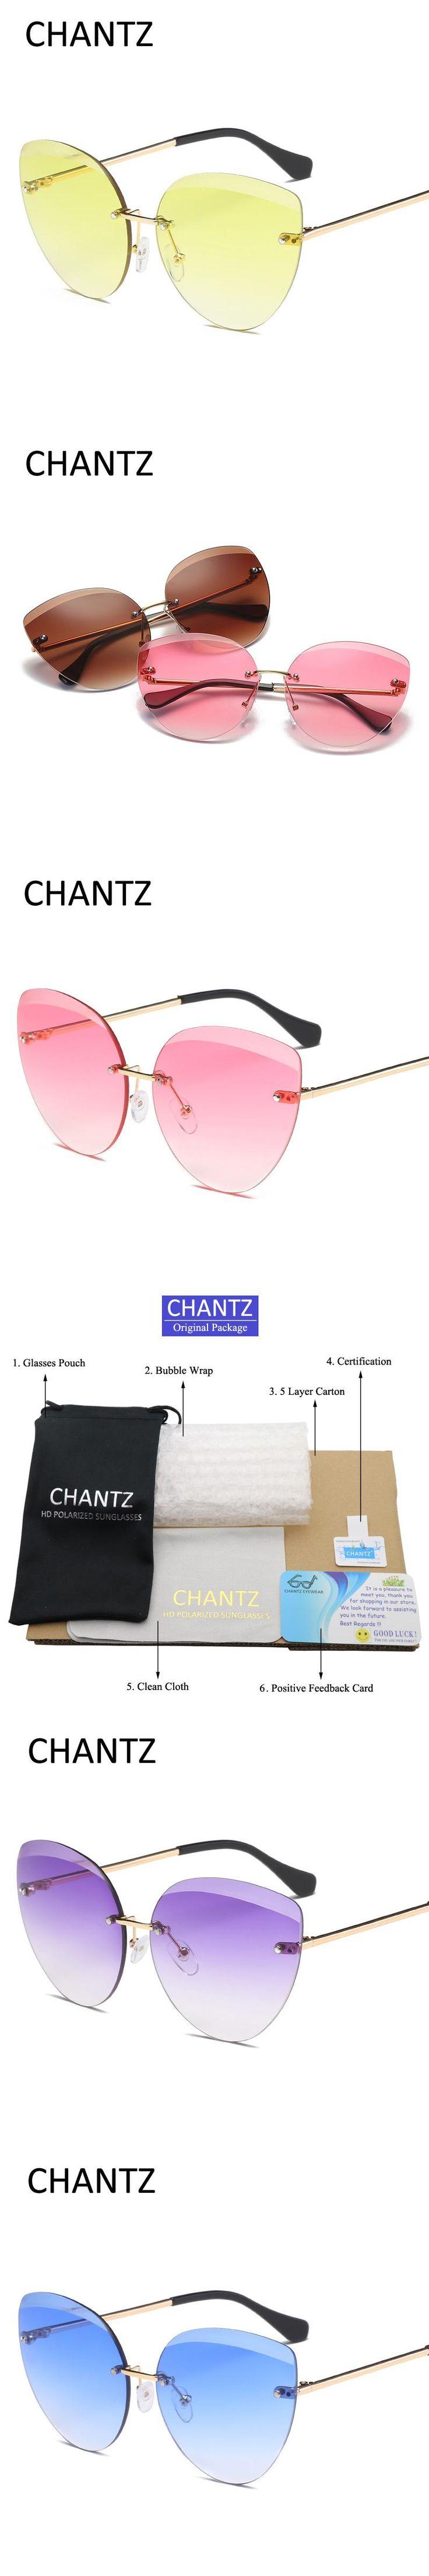 Fashion Cat Eye Sunglasses Women Ocean Lens 2017 Brand Metal Driving Sun Glasses Female Shades UV400 Lunettes De Soleil Femme